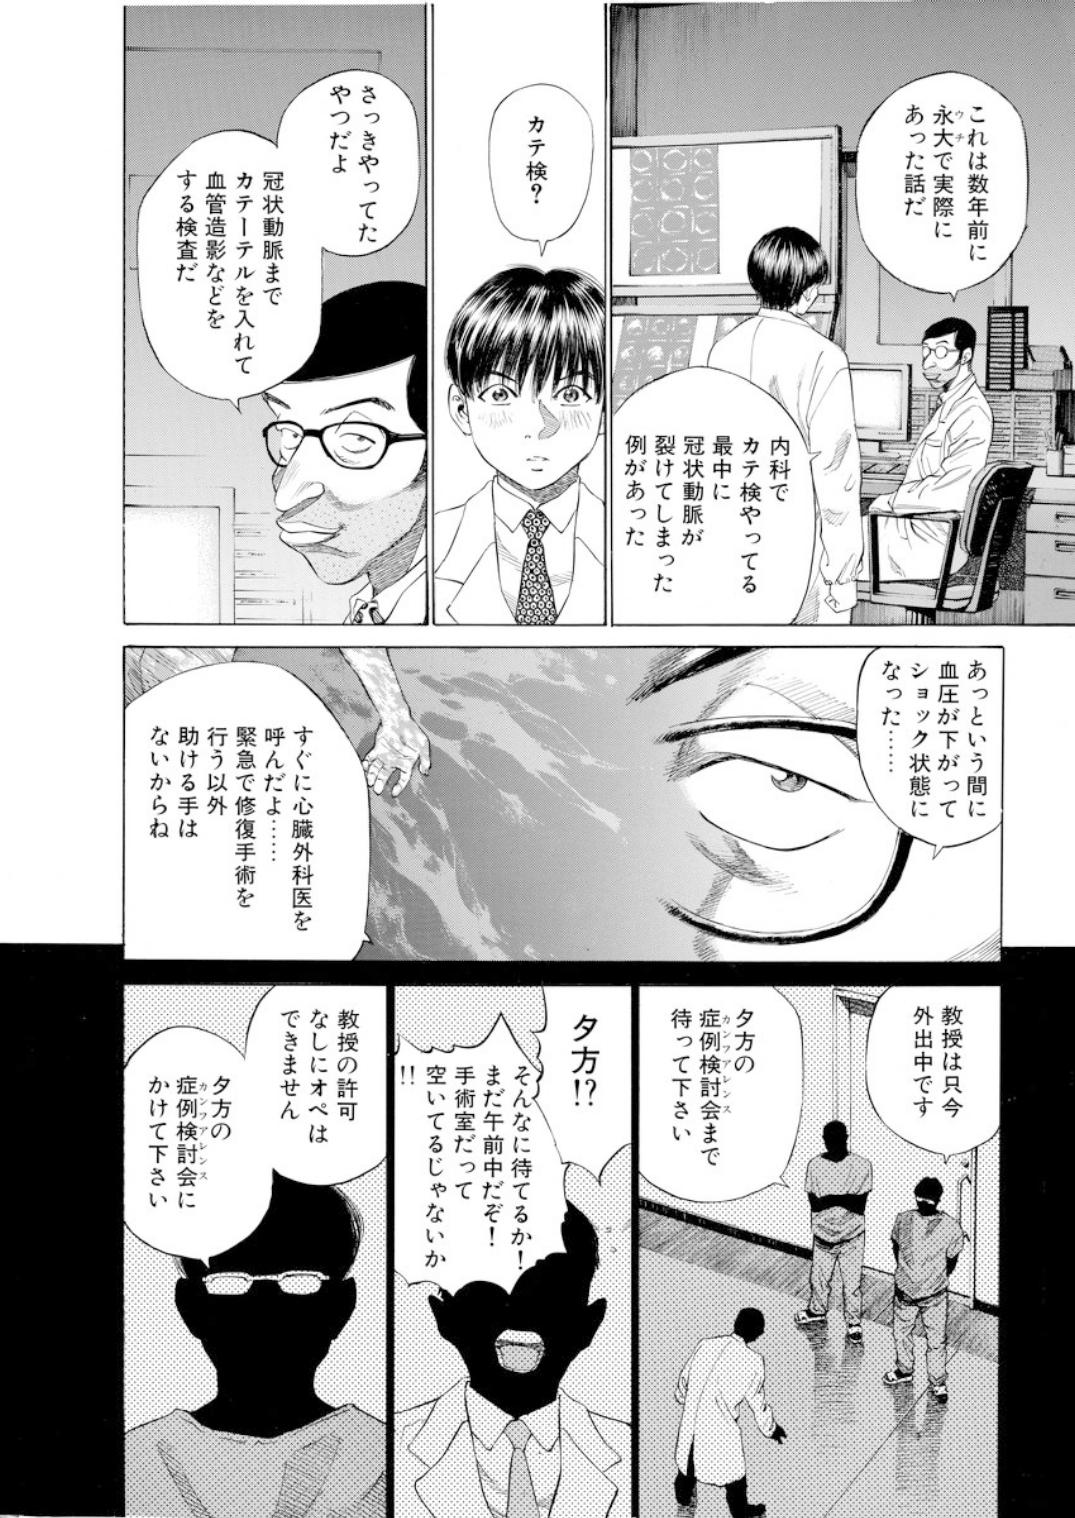 001bj_page-0174.jpg